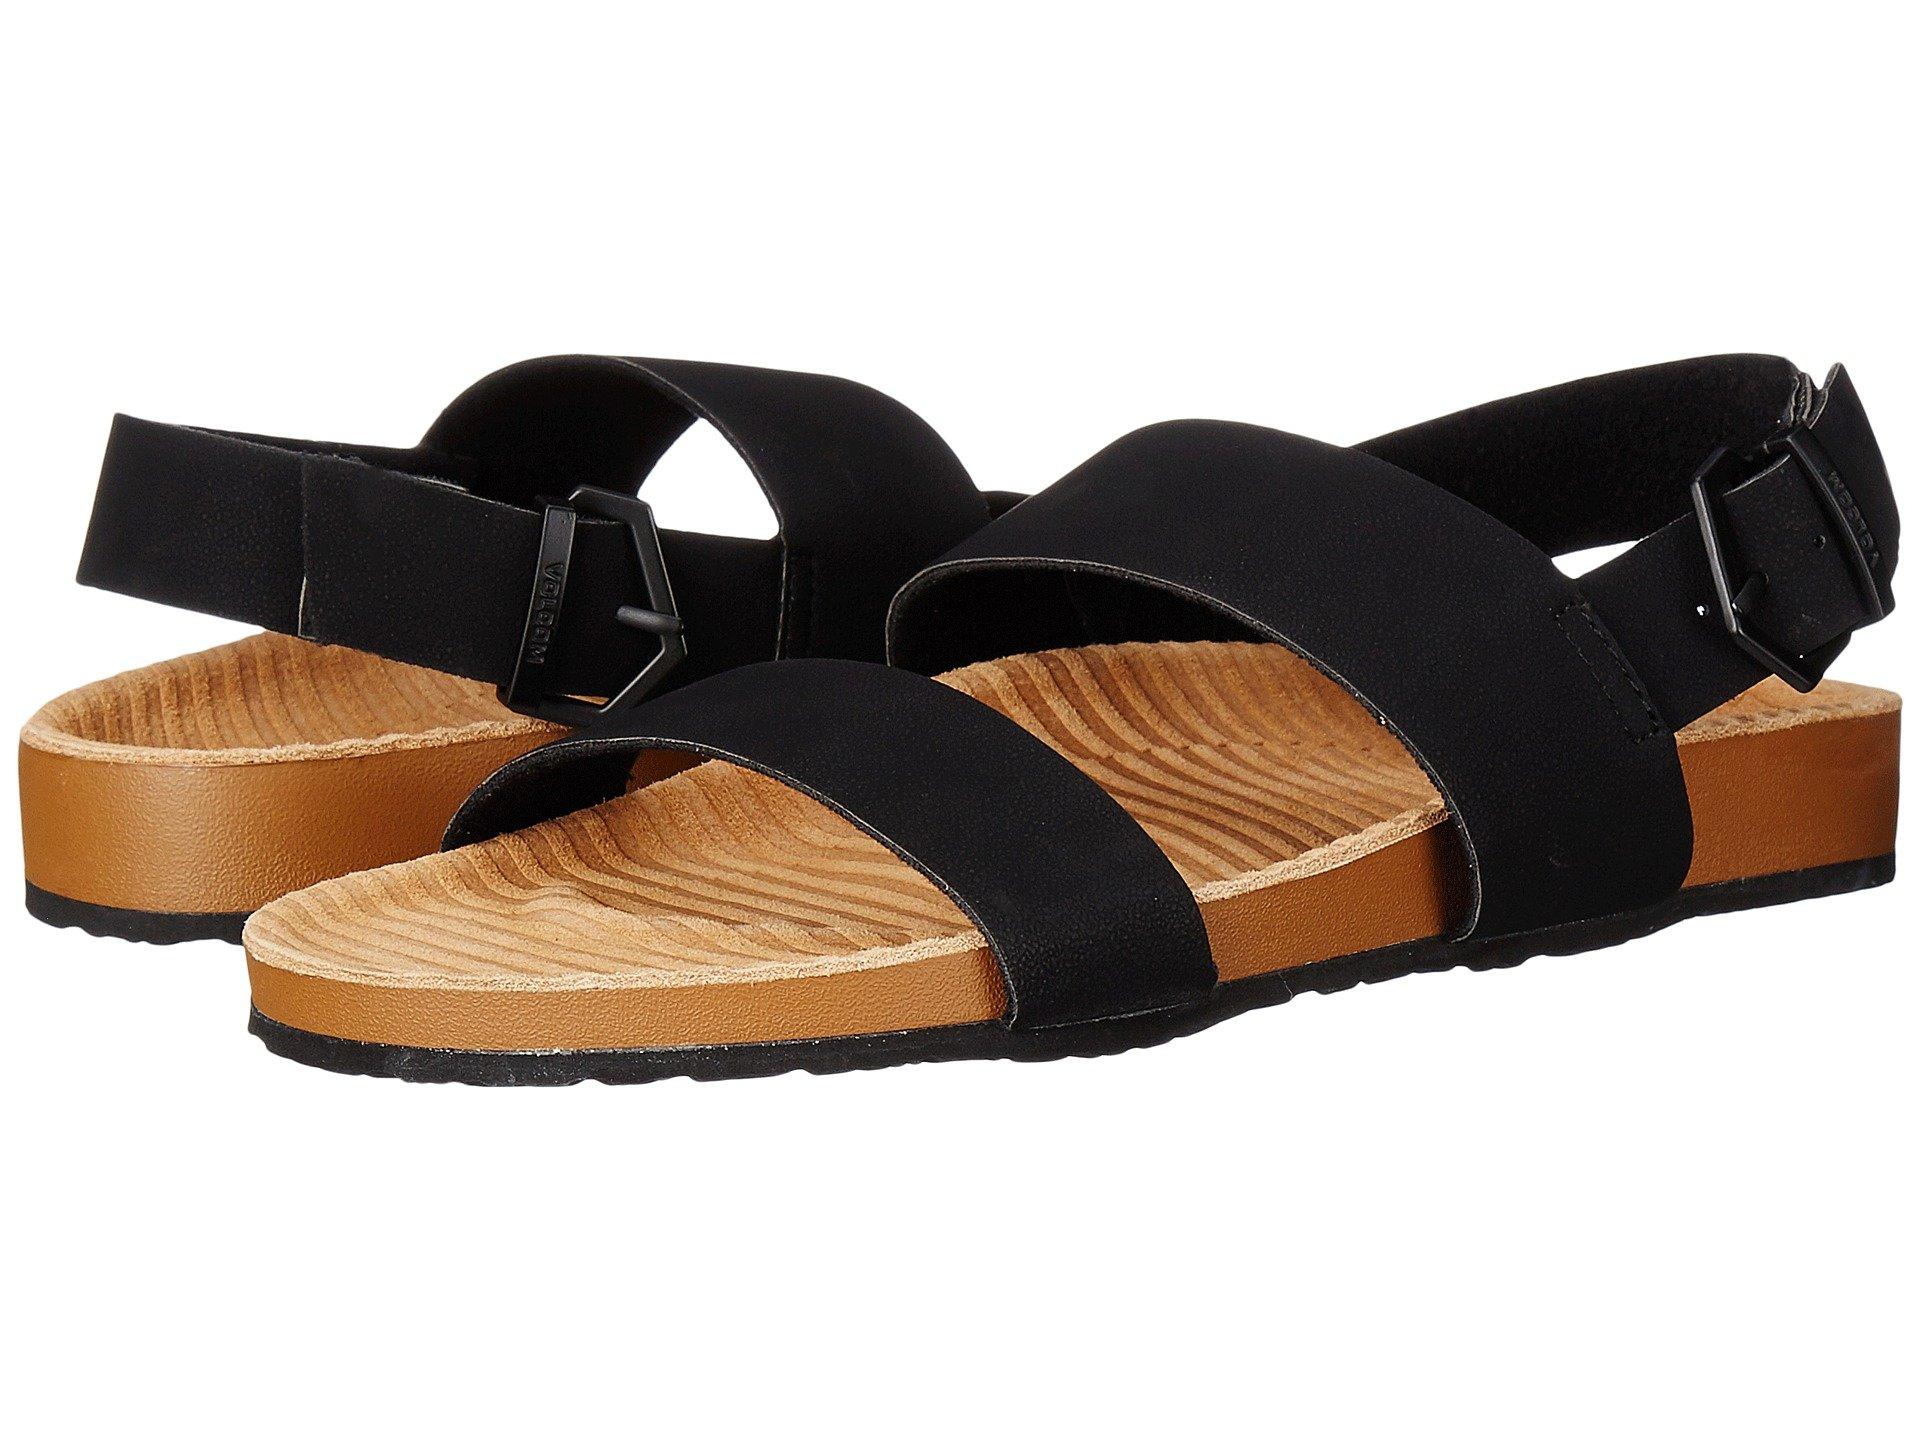 Sandalias para Mujer Volcom Unwind Sandal  + Volcom en VeoyCompro.net